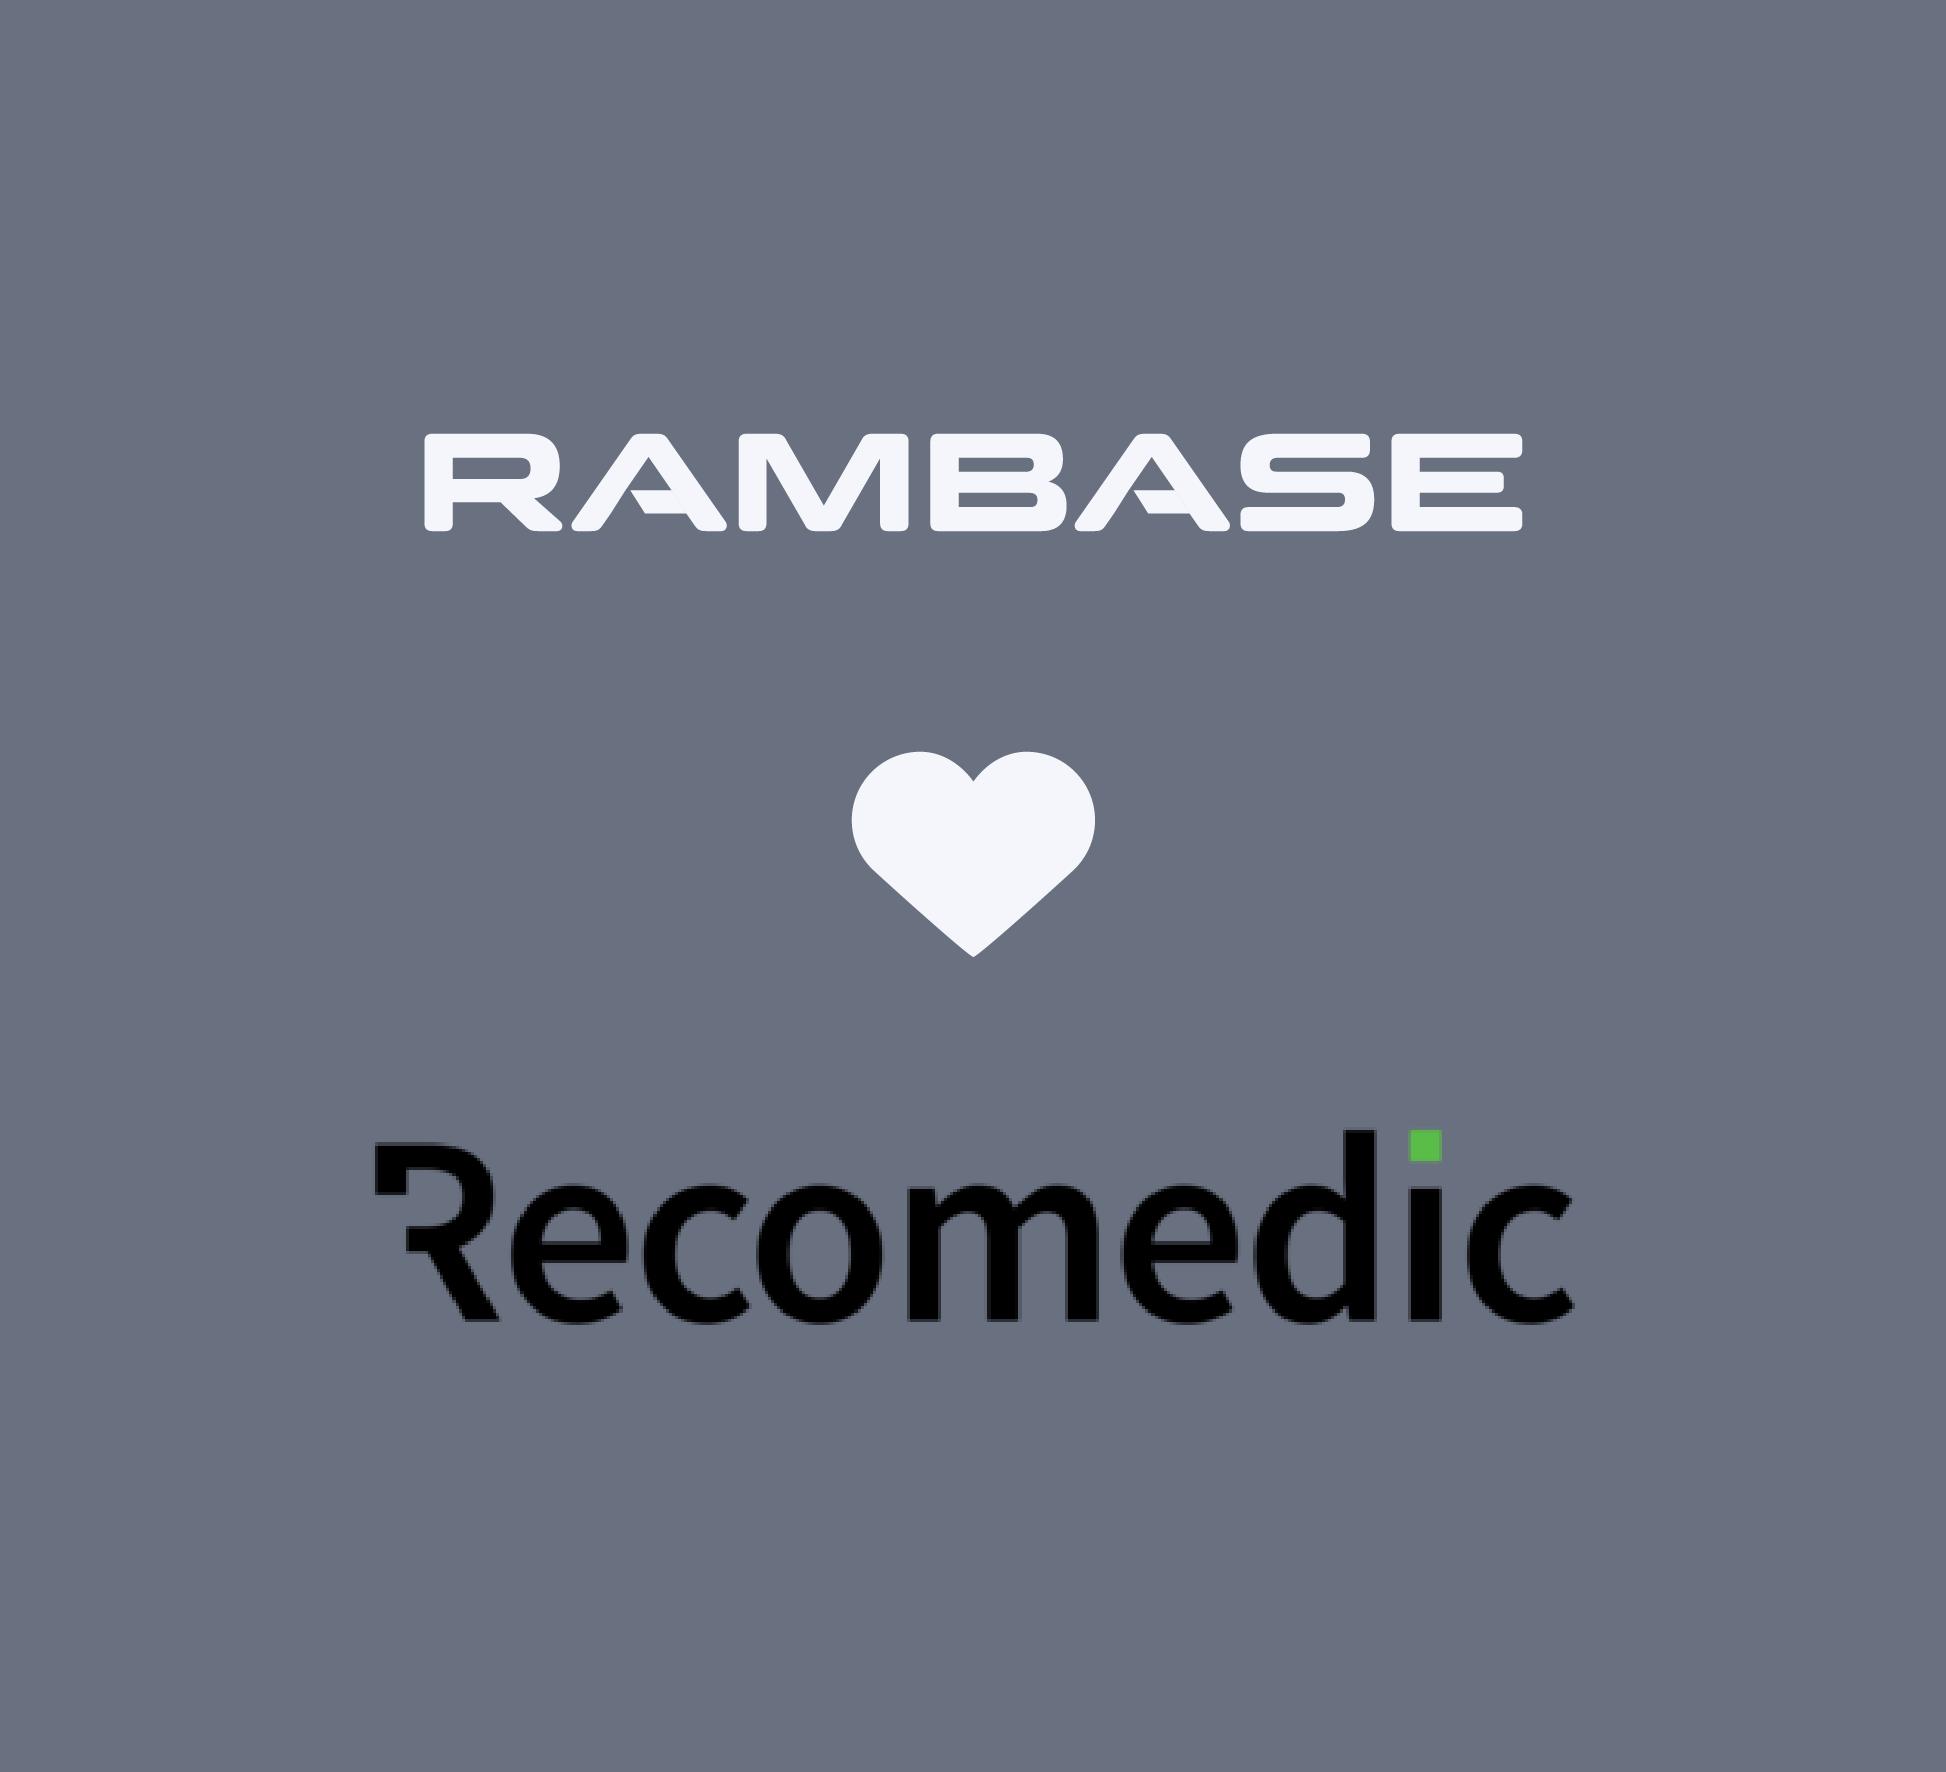 heartpost_recomedic_1080x1080-02-2